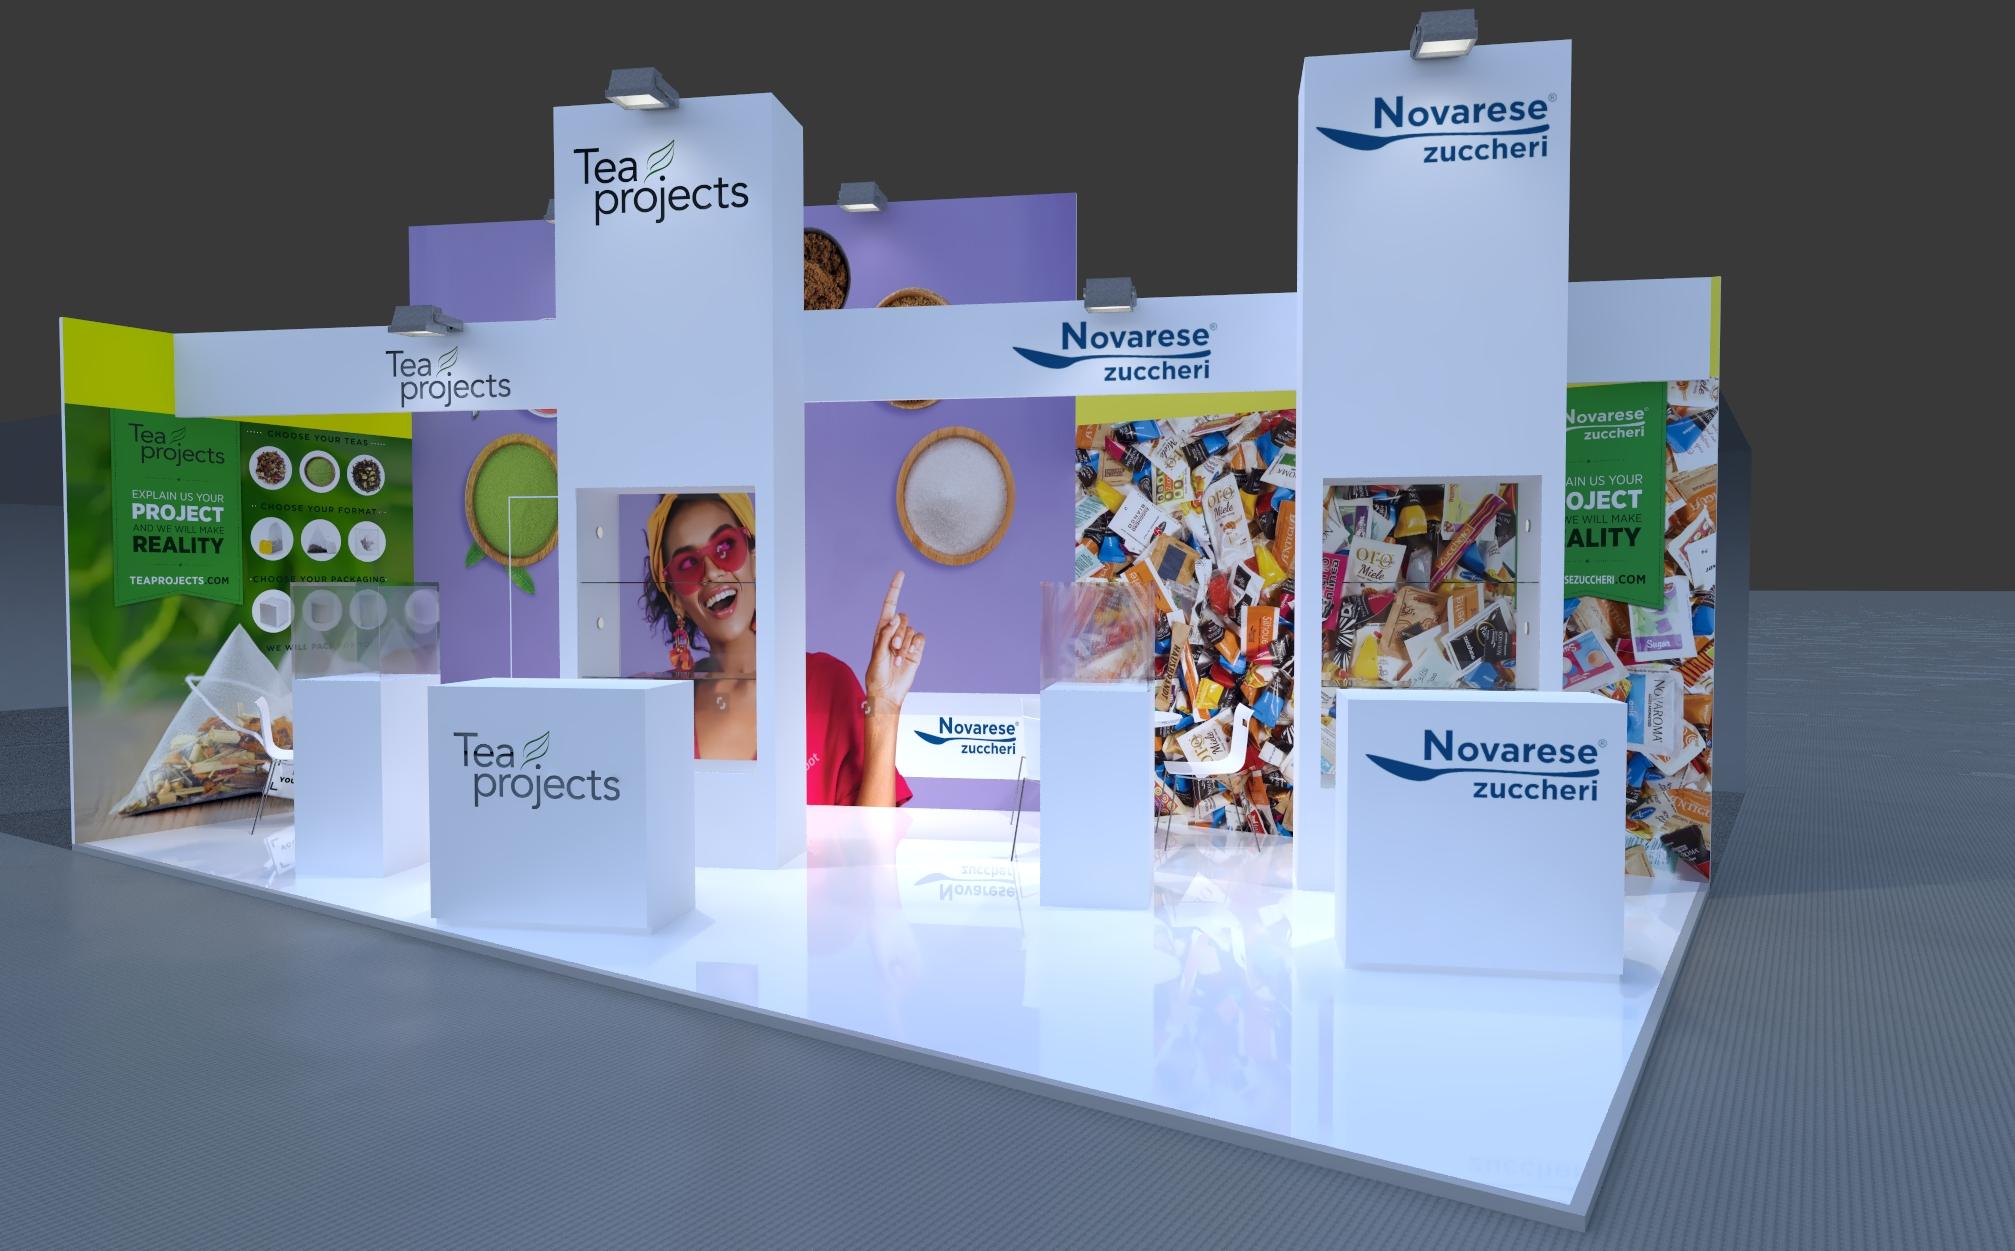 Host 2019 - Progetto Novarese Zuccheri